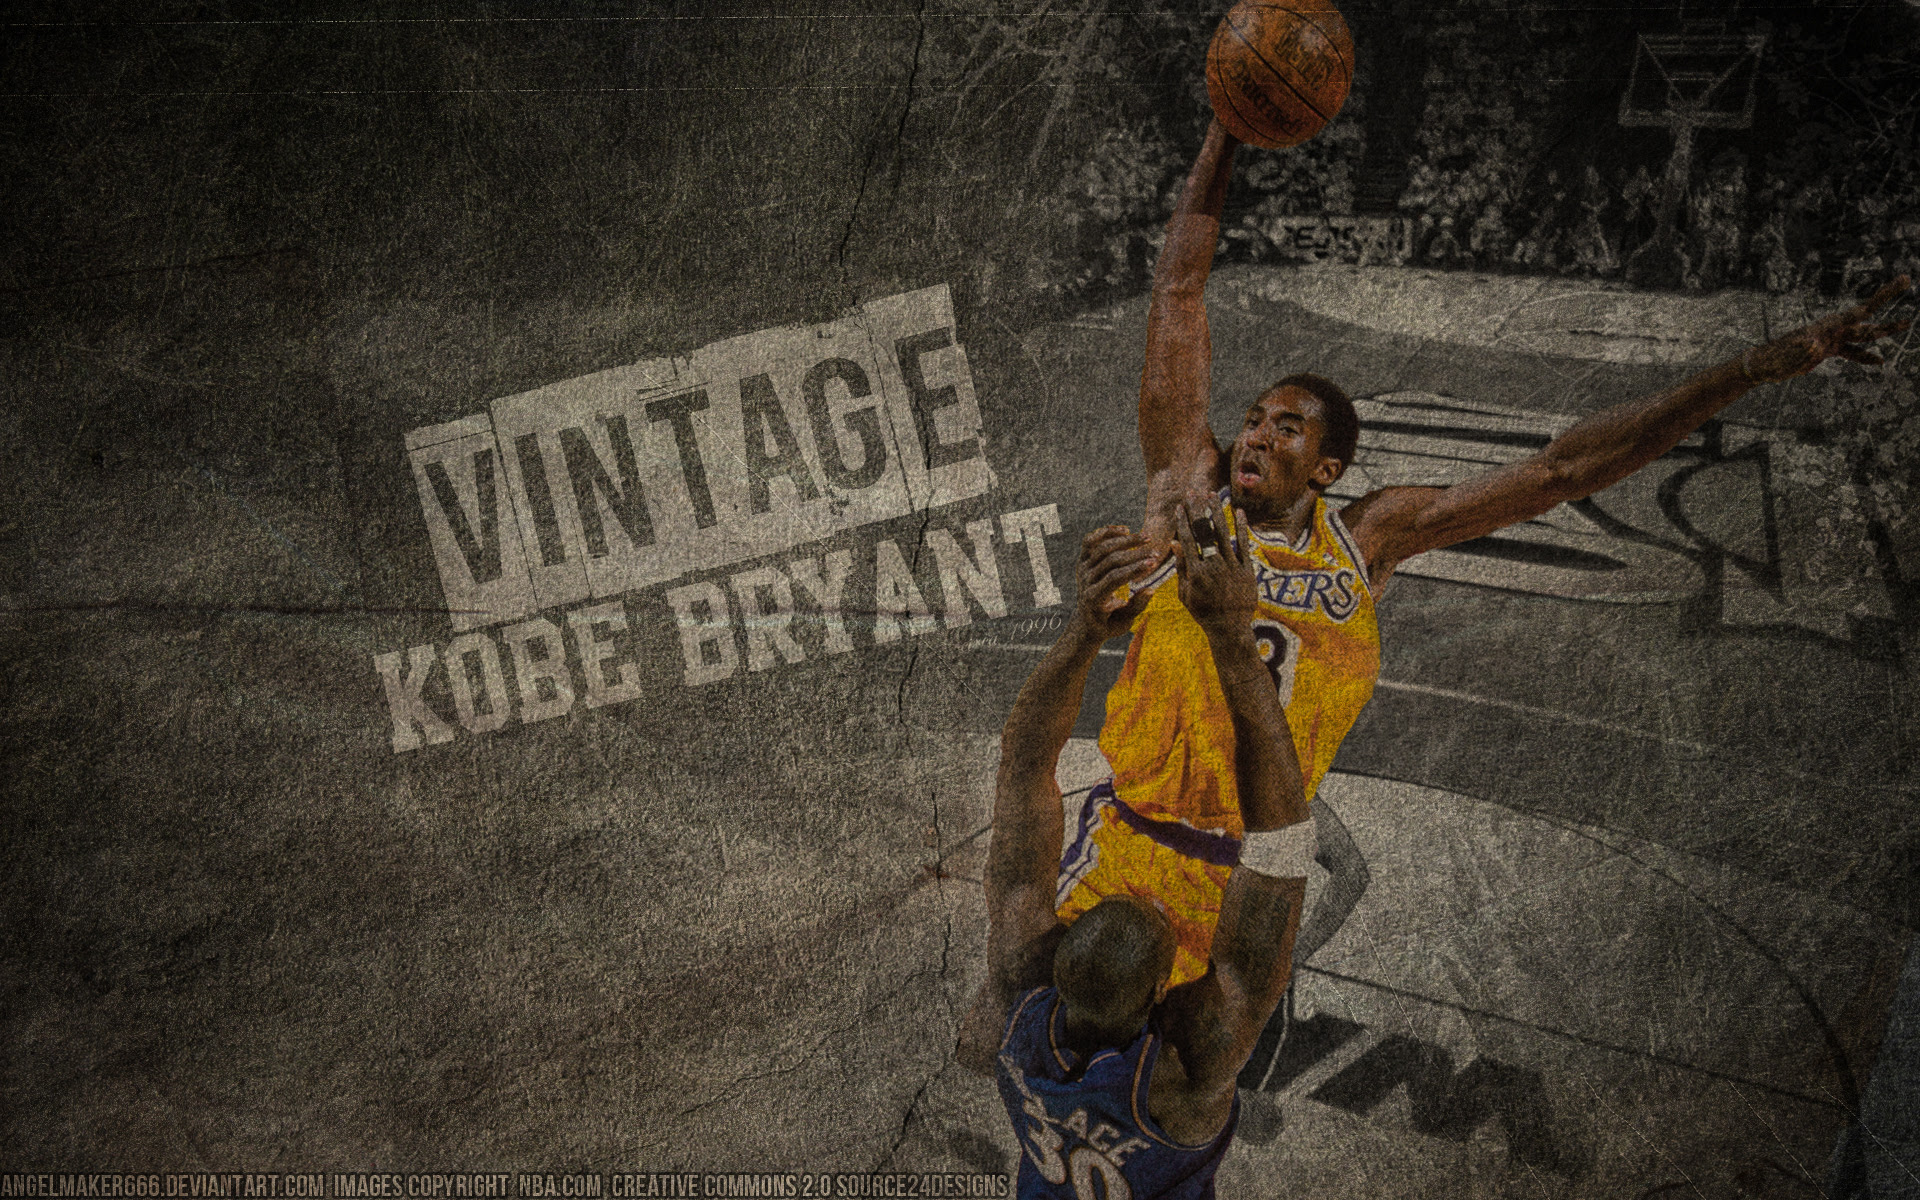 The Top 10 Los Angeles Lakers Kobe Bryant Nba Wallpapers